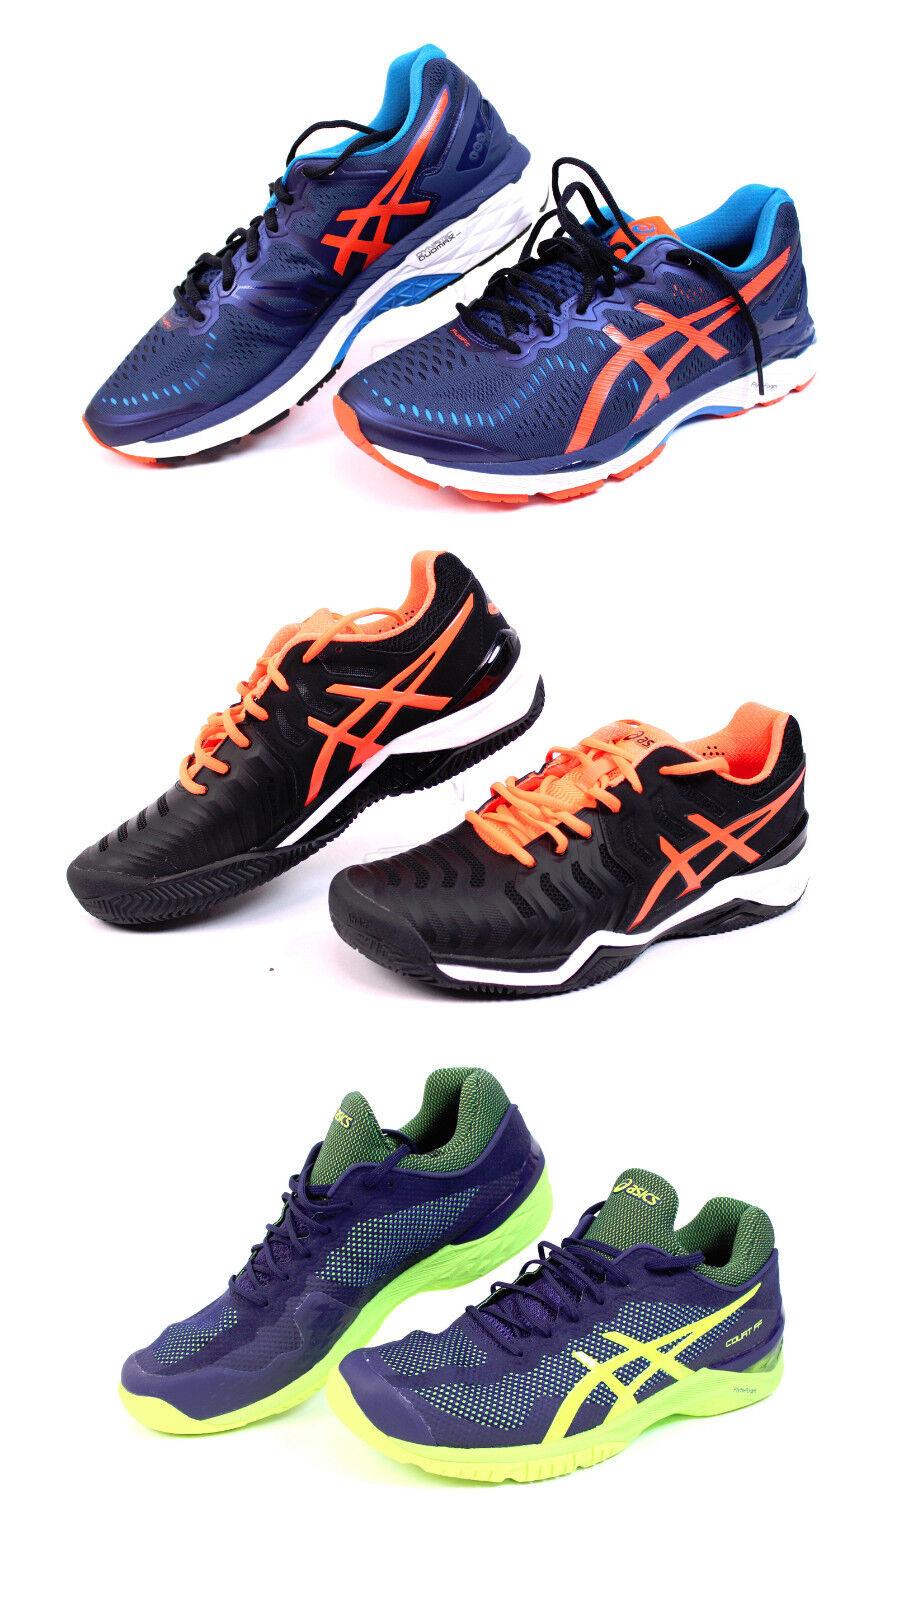 ASICS Laufschuhe Gel-Kayano Resolution 7 Court FF 43.5 45 46 TENNIS Sport Schuhe  | Hohe Qualität und geringer Aufwand